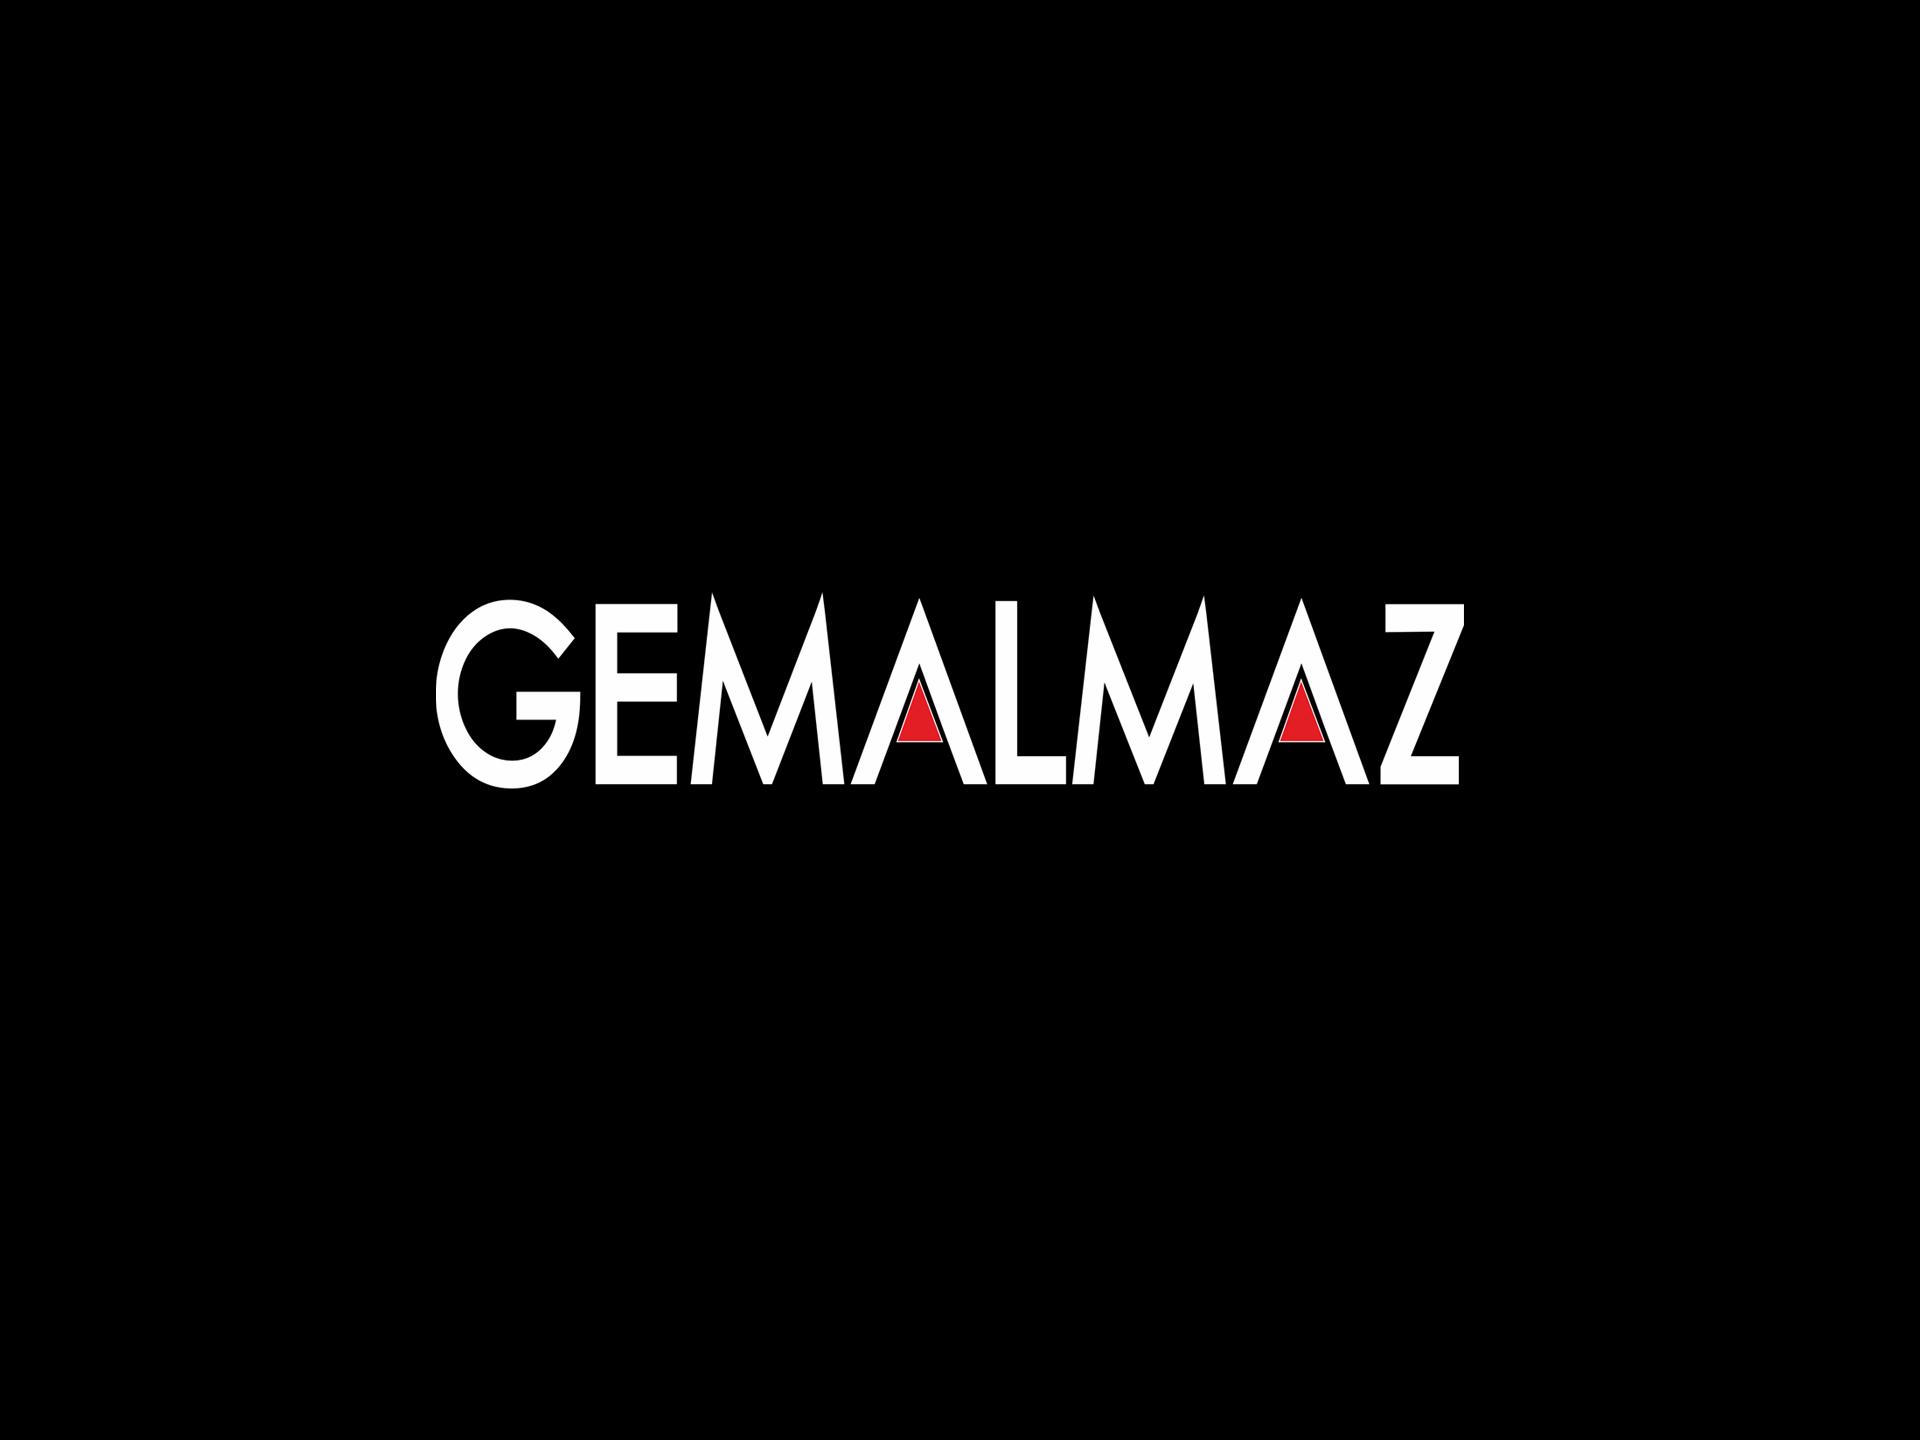 Gemalmaz Reklam-img4